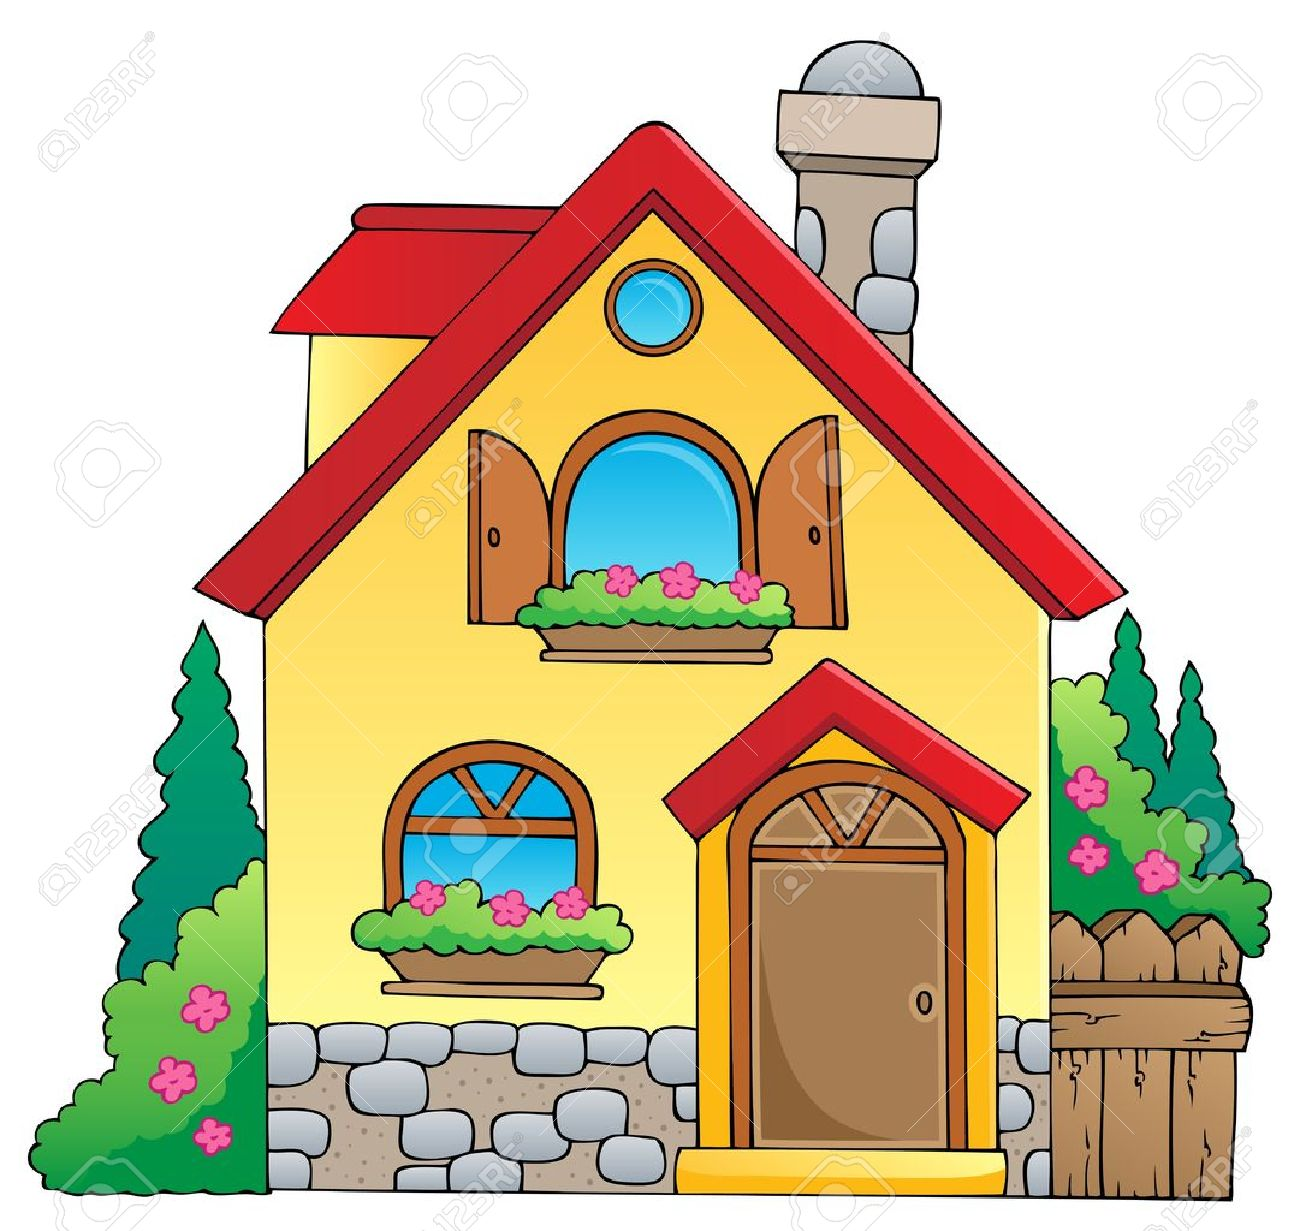 Haus bauen comic  Cartoon Haus Lizenzfreie Vektorgrafiken Kaufen: 123RF